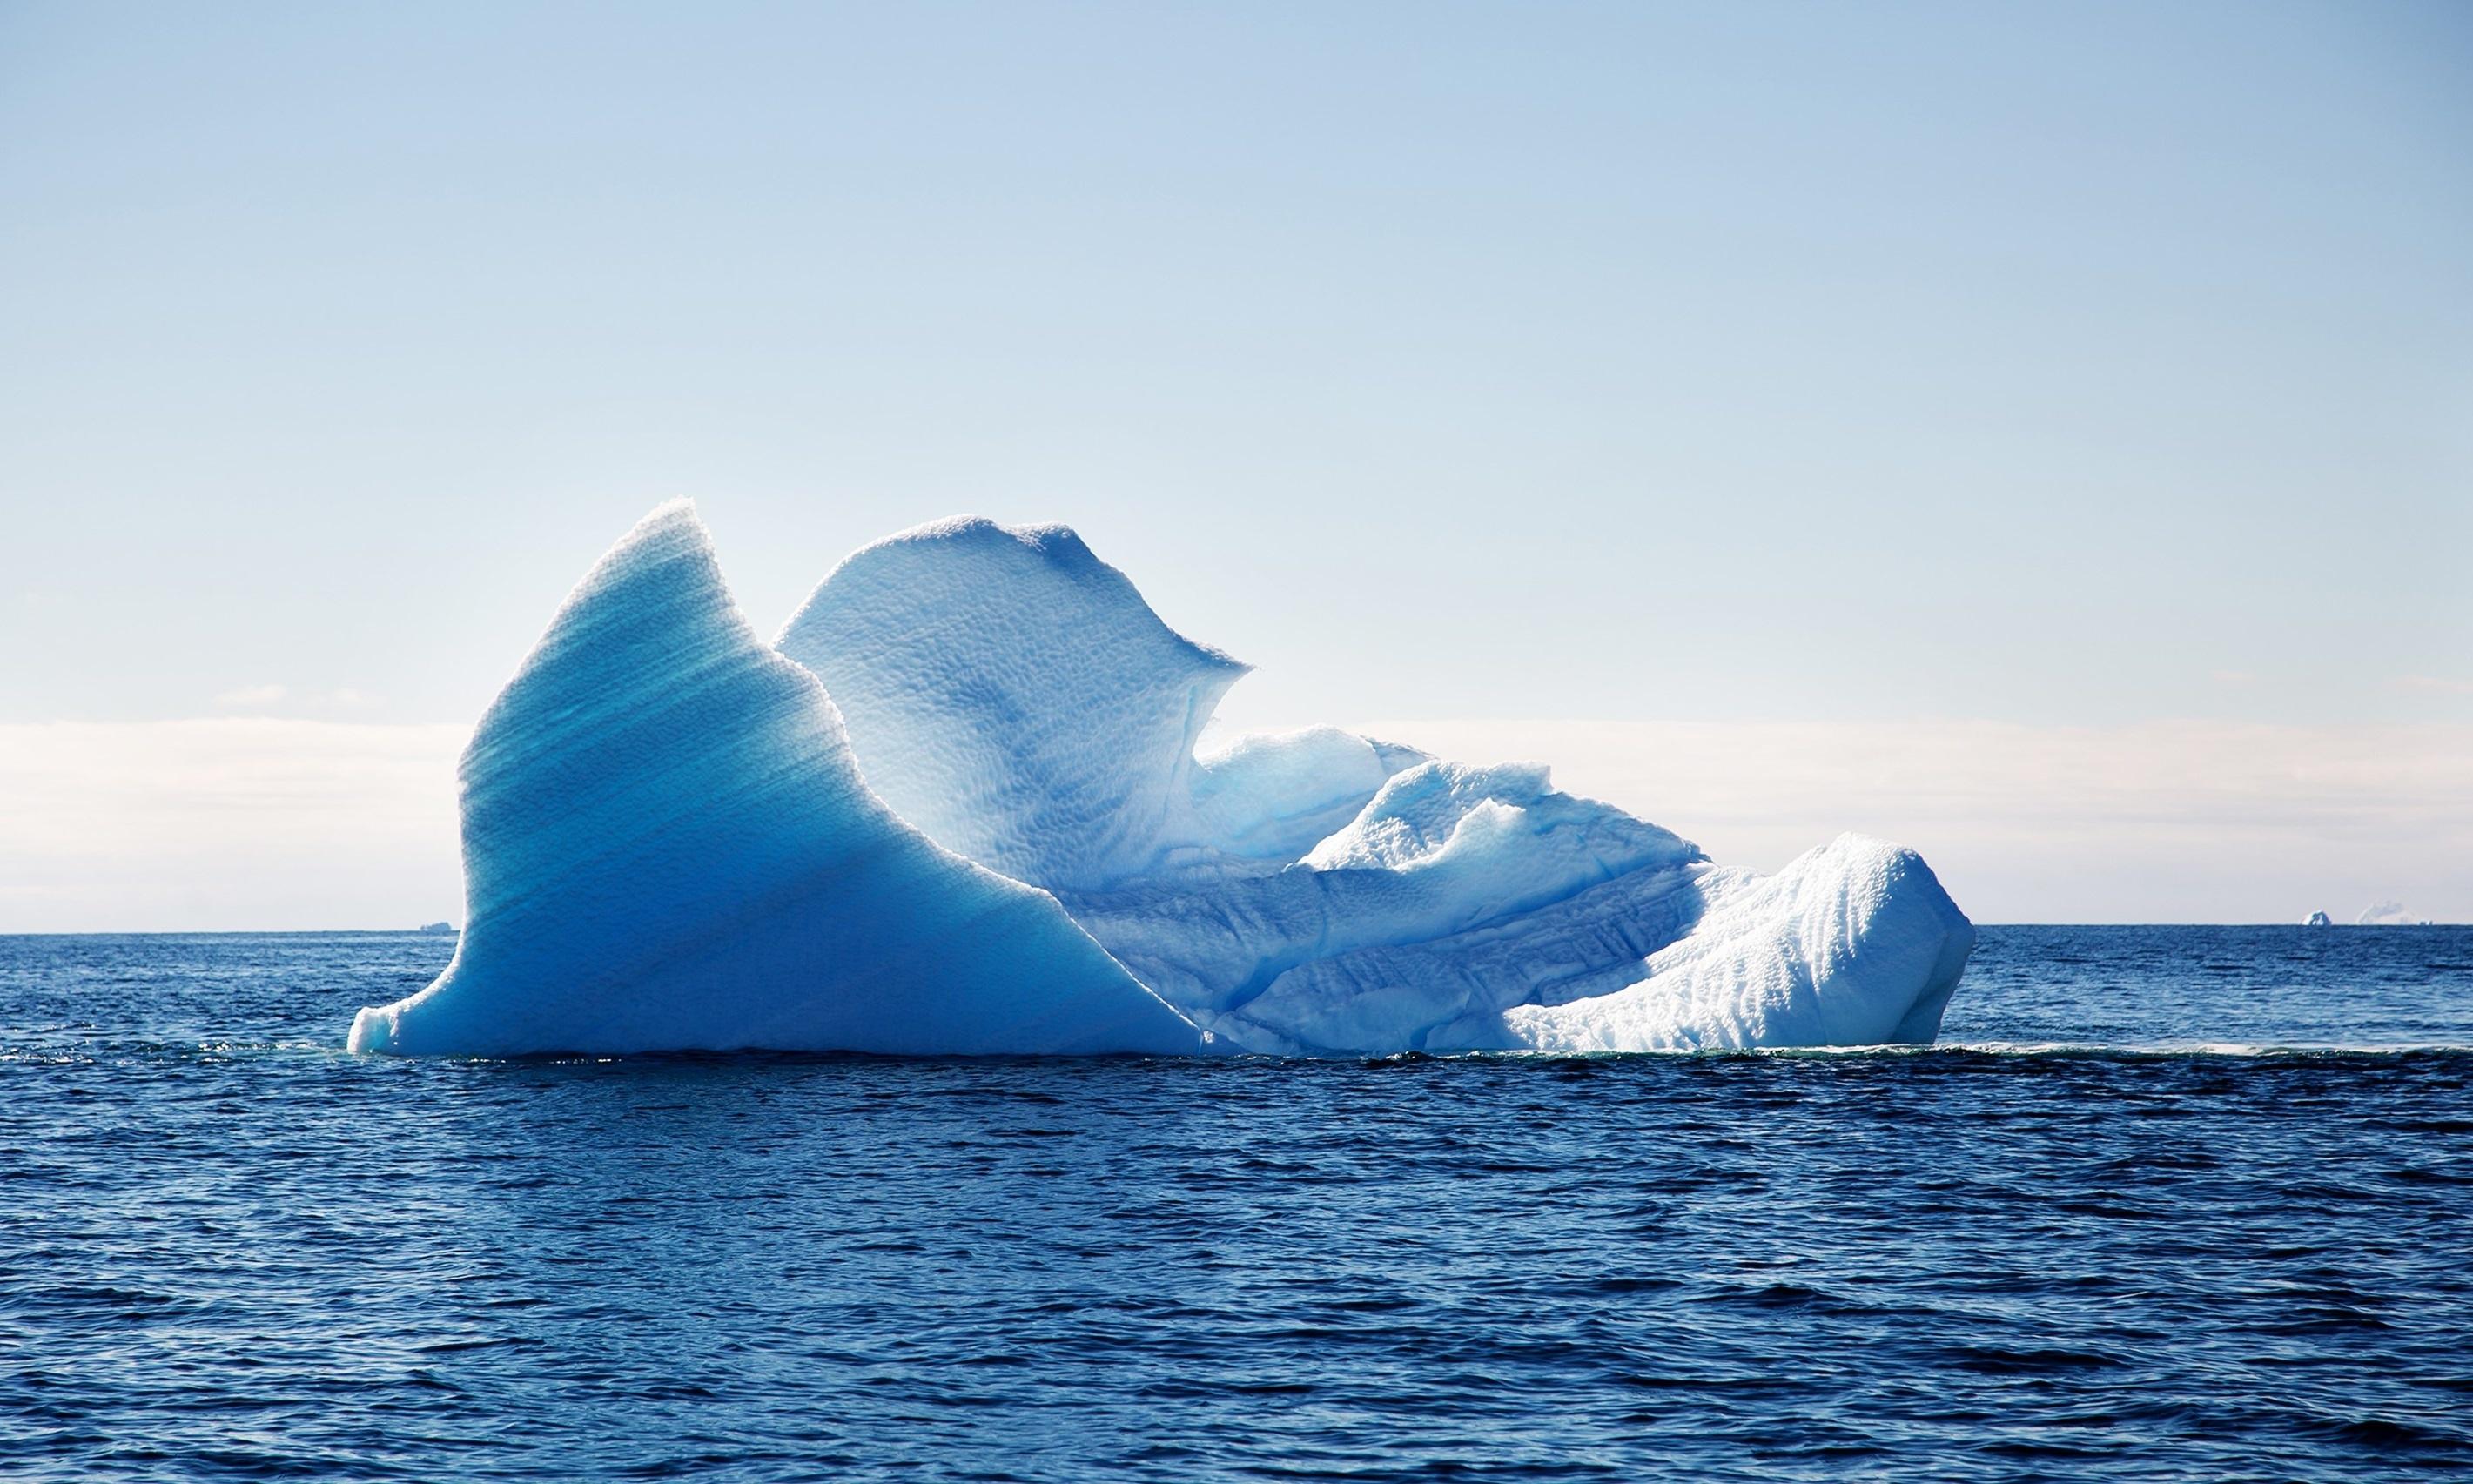 Antarctic-picture-iceberg.jpg